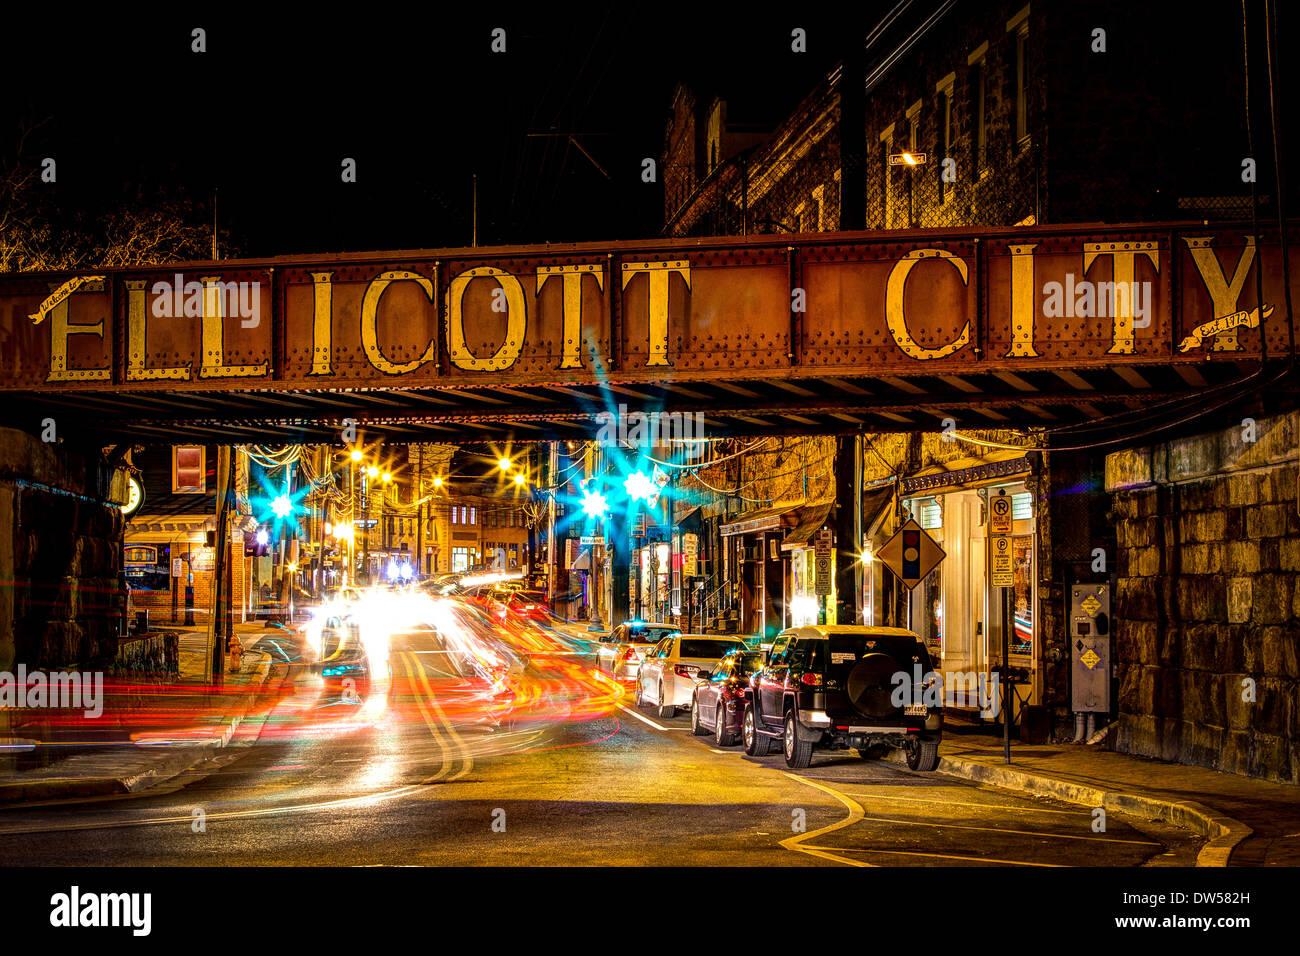 Traffic On Ellicott City Main Street Stock Photo Royalty